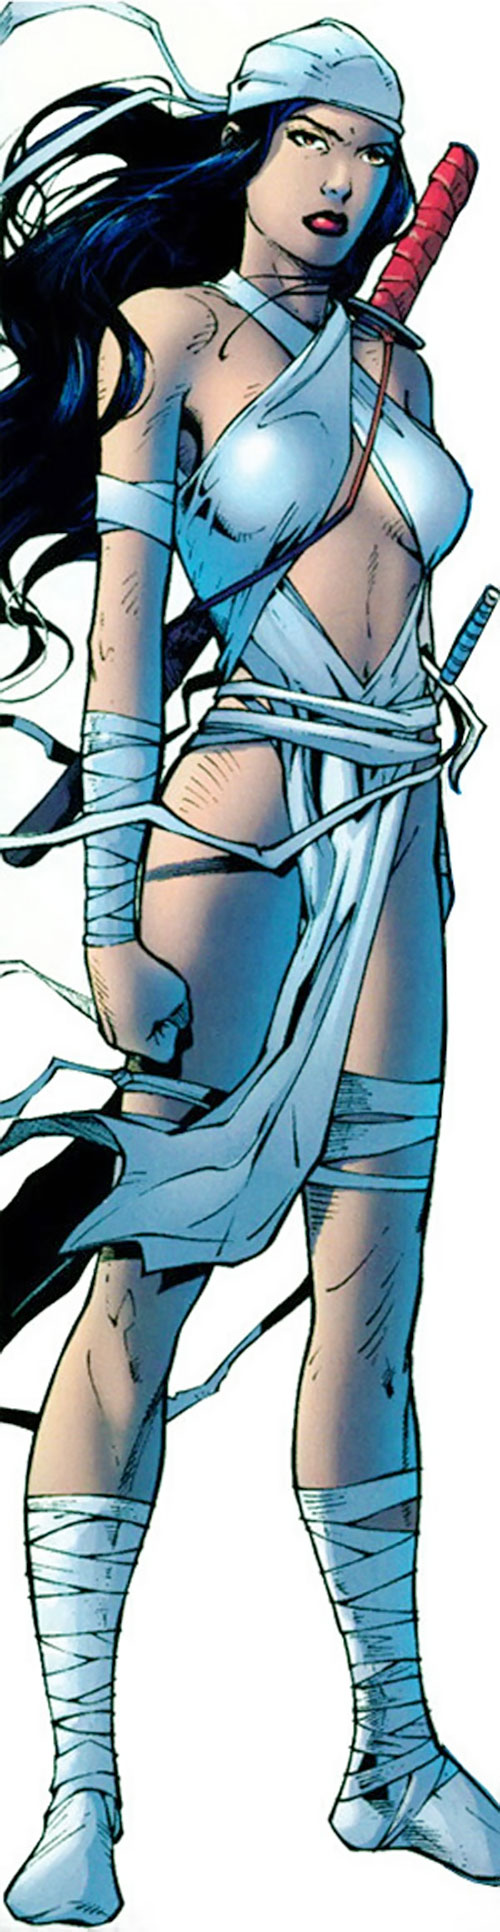 Elektra (Marvel Comics) in white